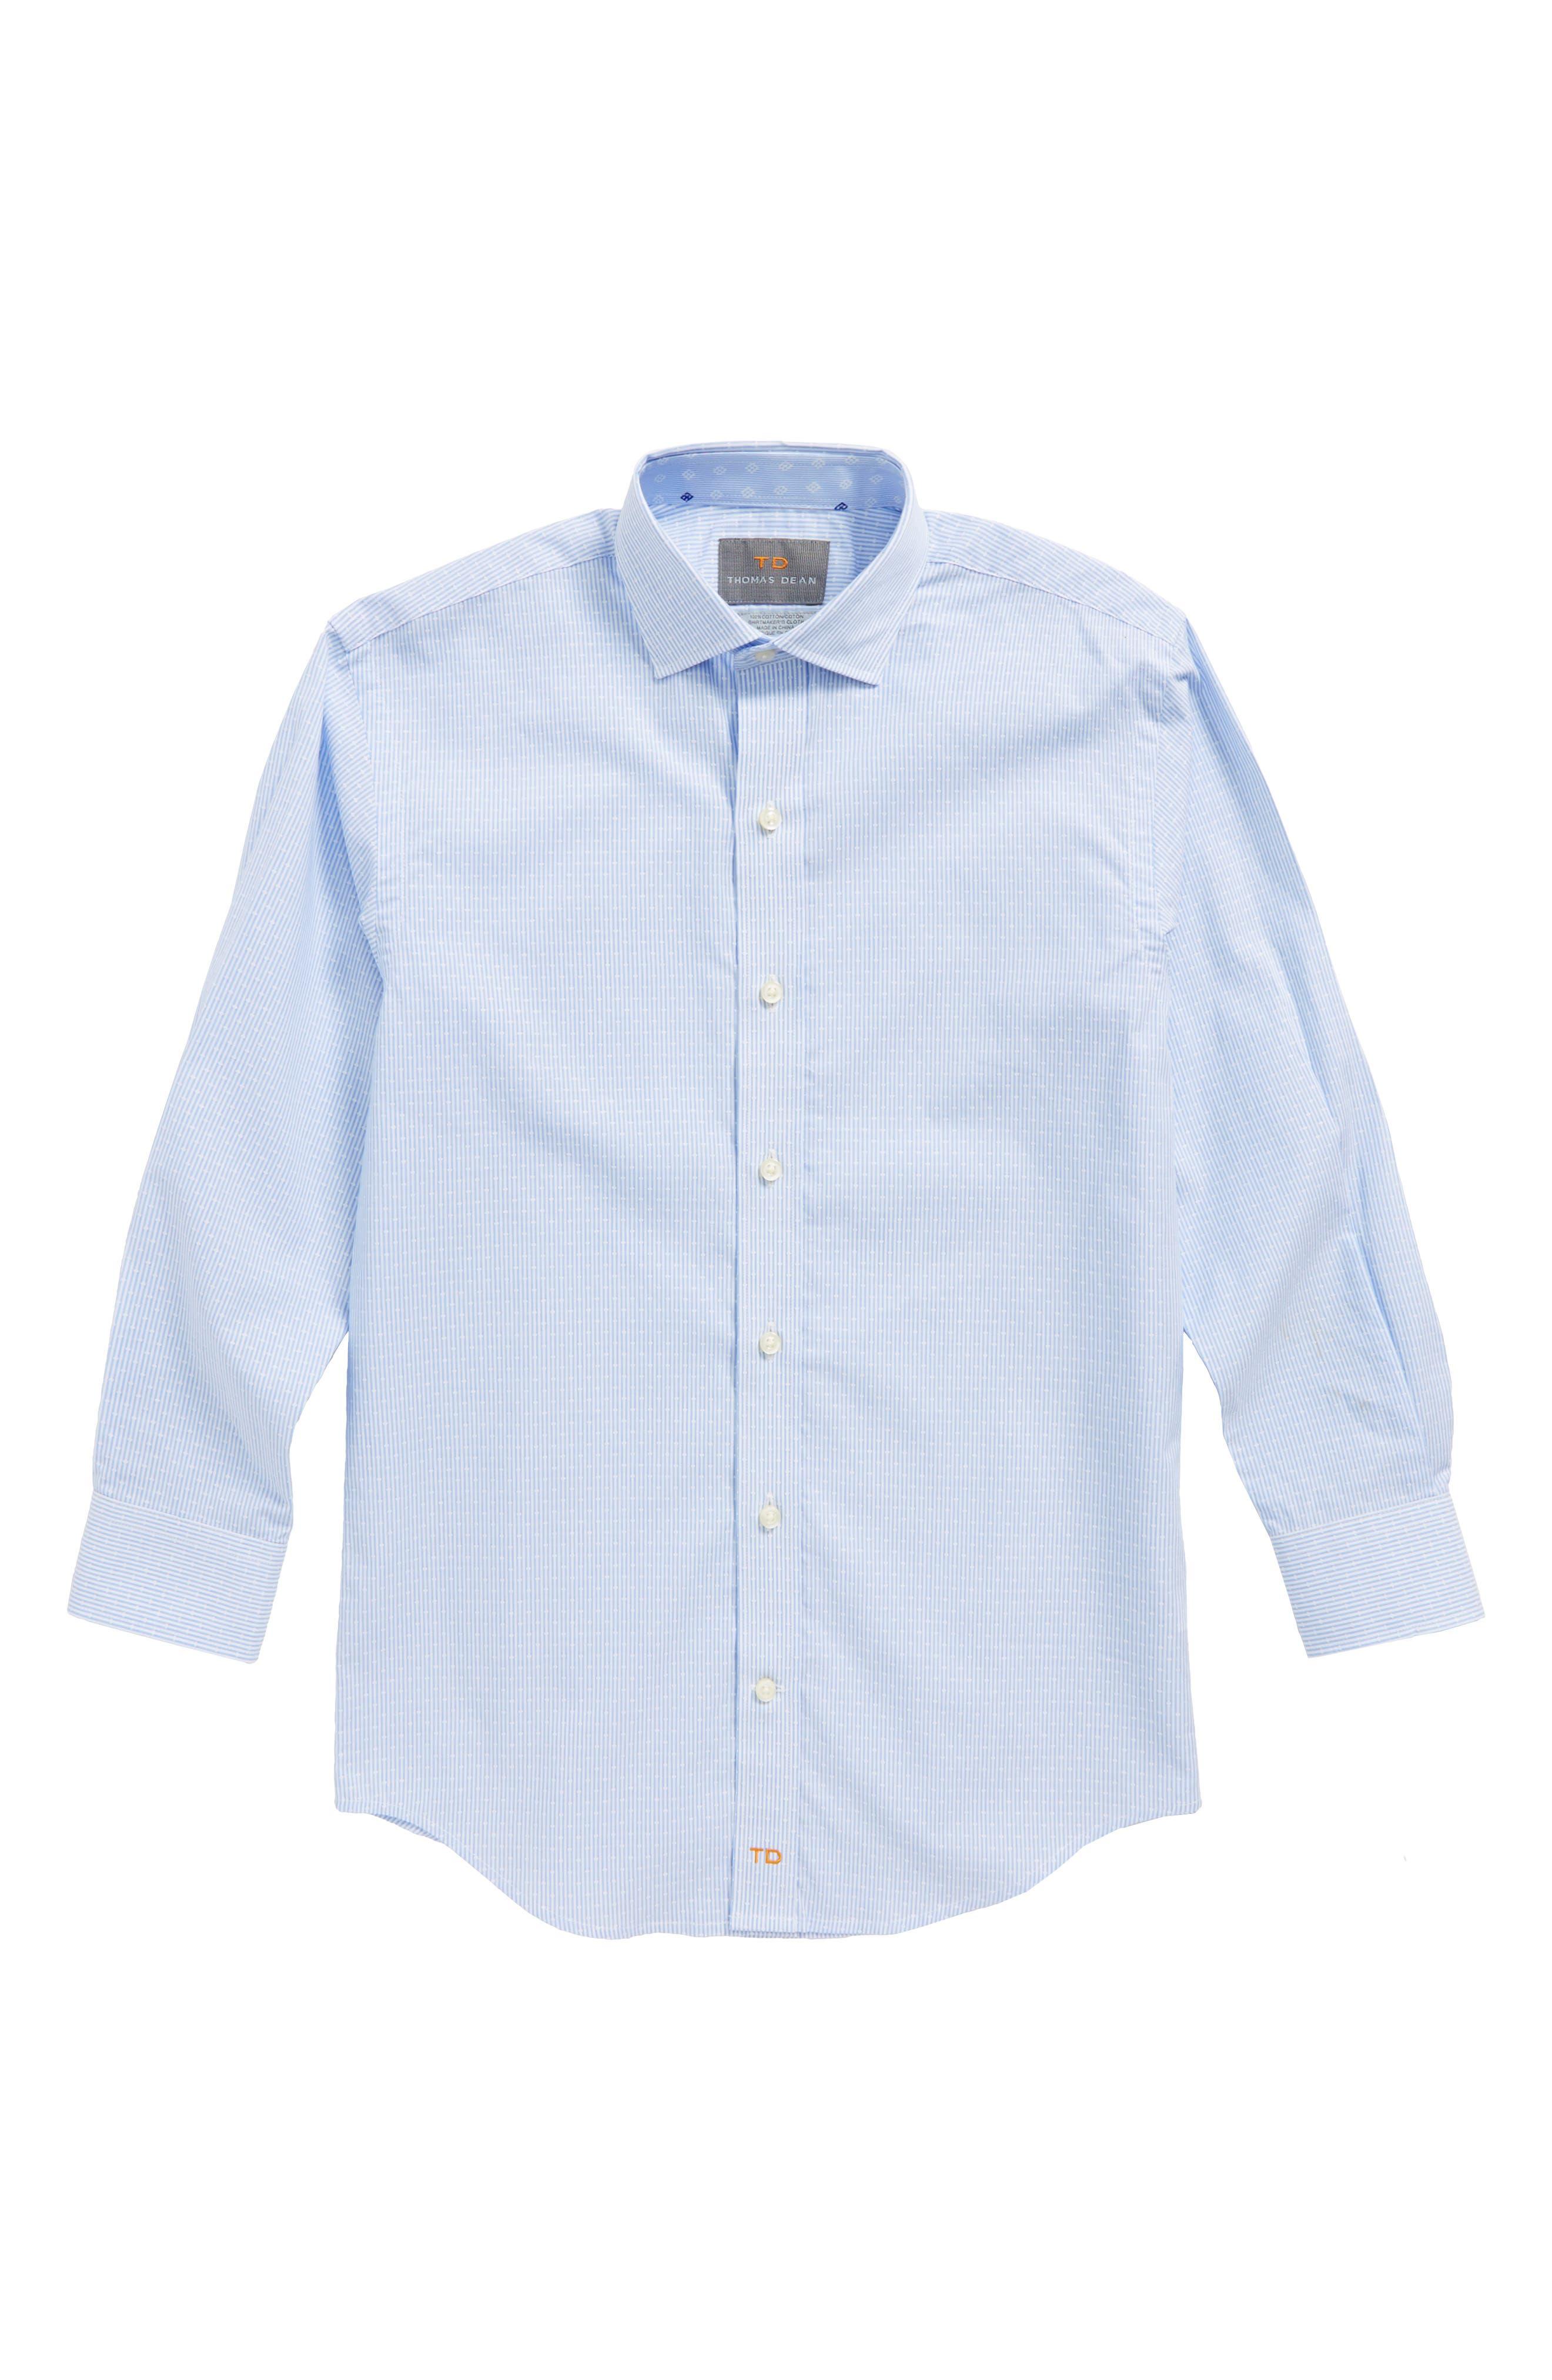 Stripe Dress Shirt,                         Main,                         color, Blue